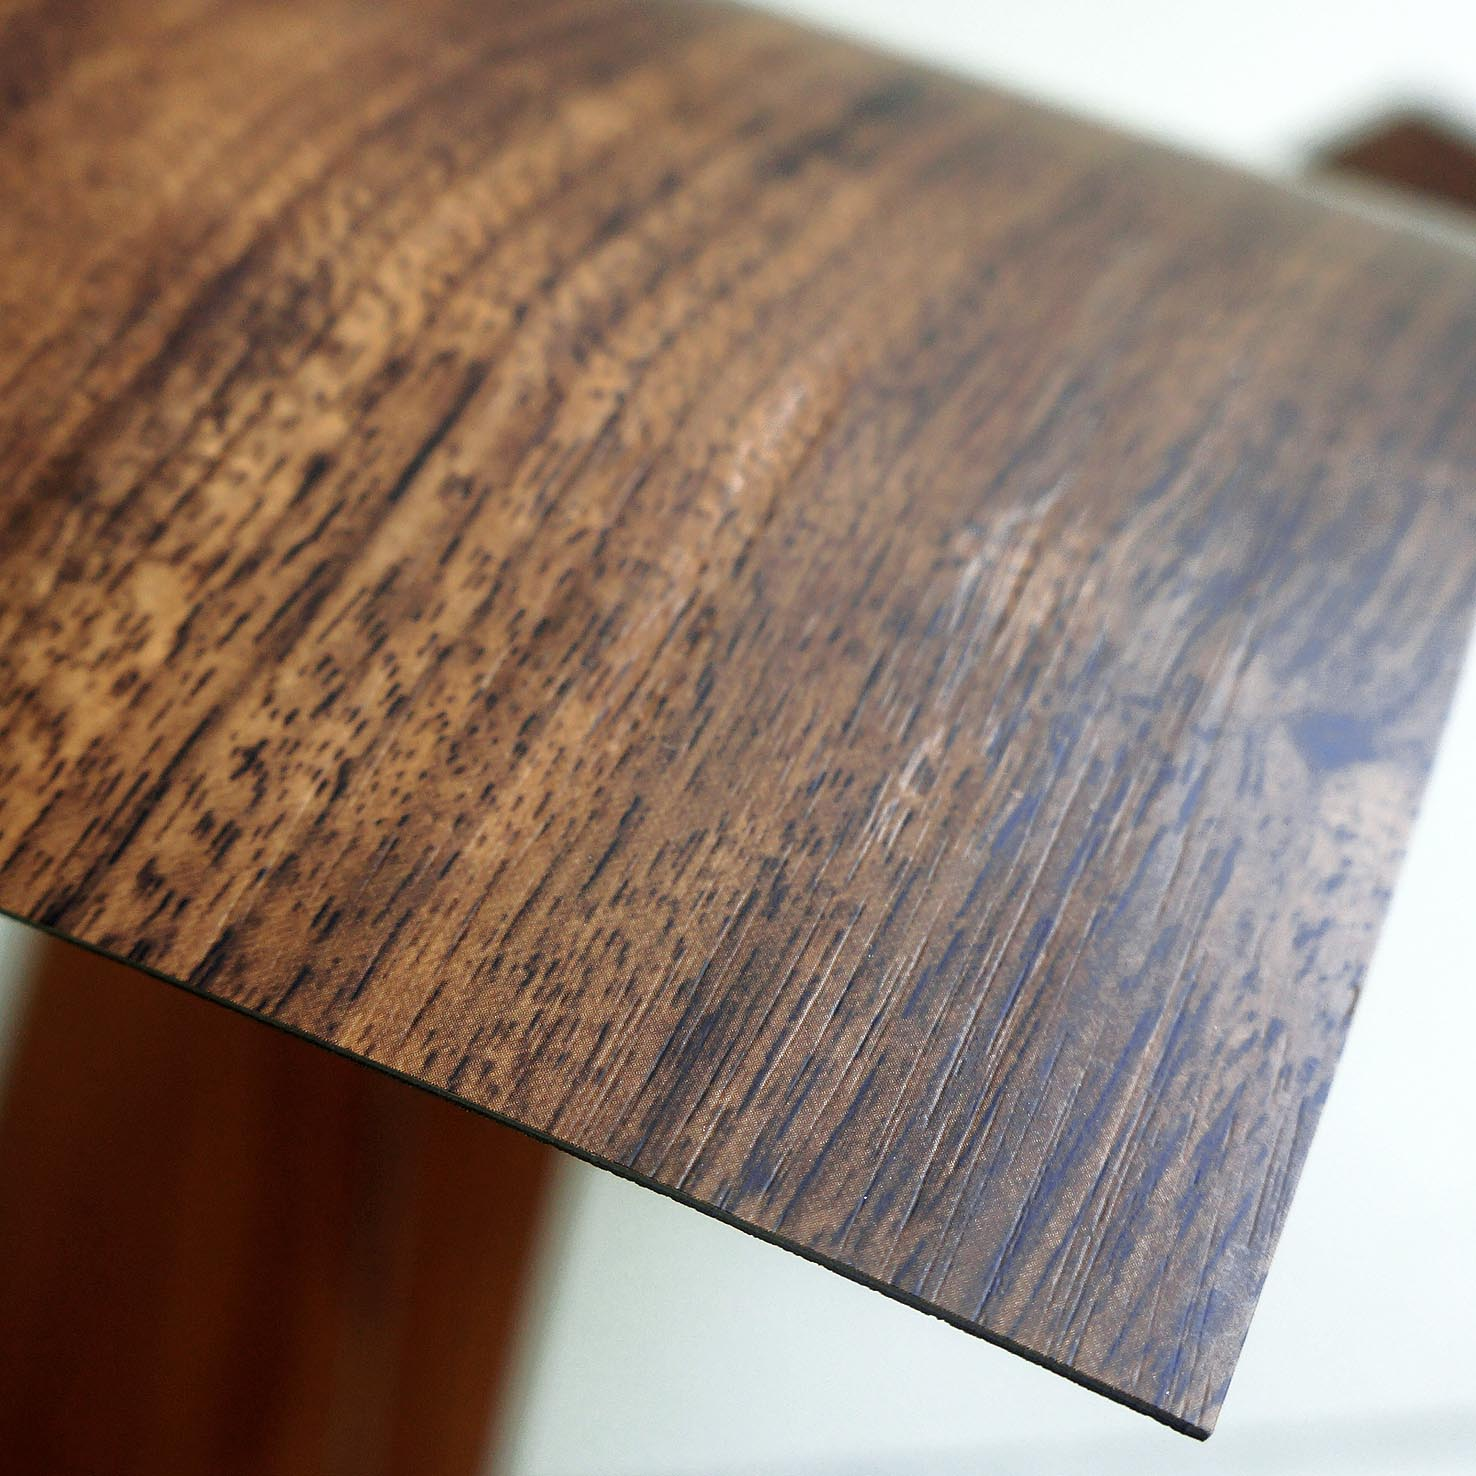 Durable wood grain dry back pvc vinyl flooring for Wood grain linoleum flooring